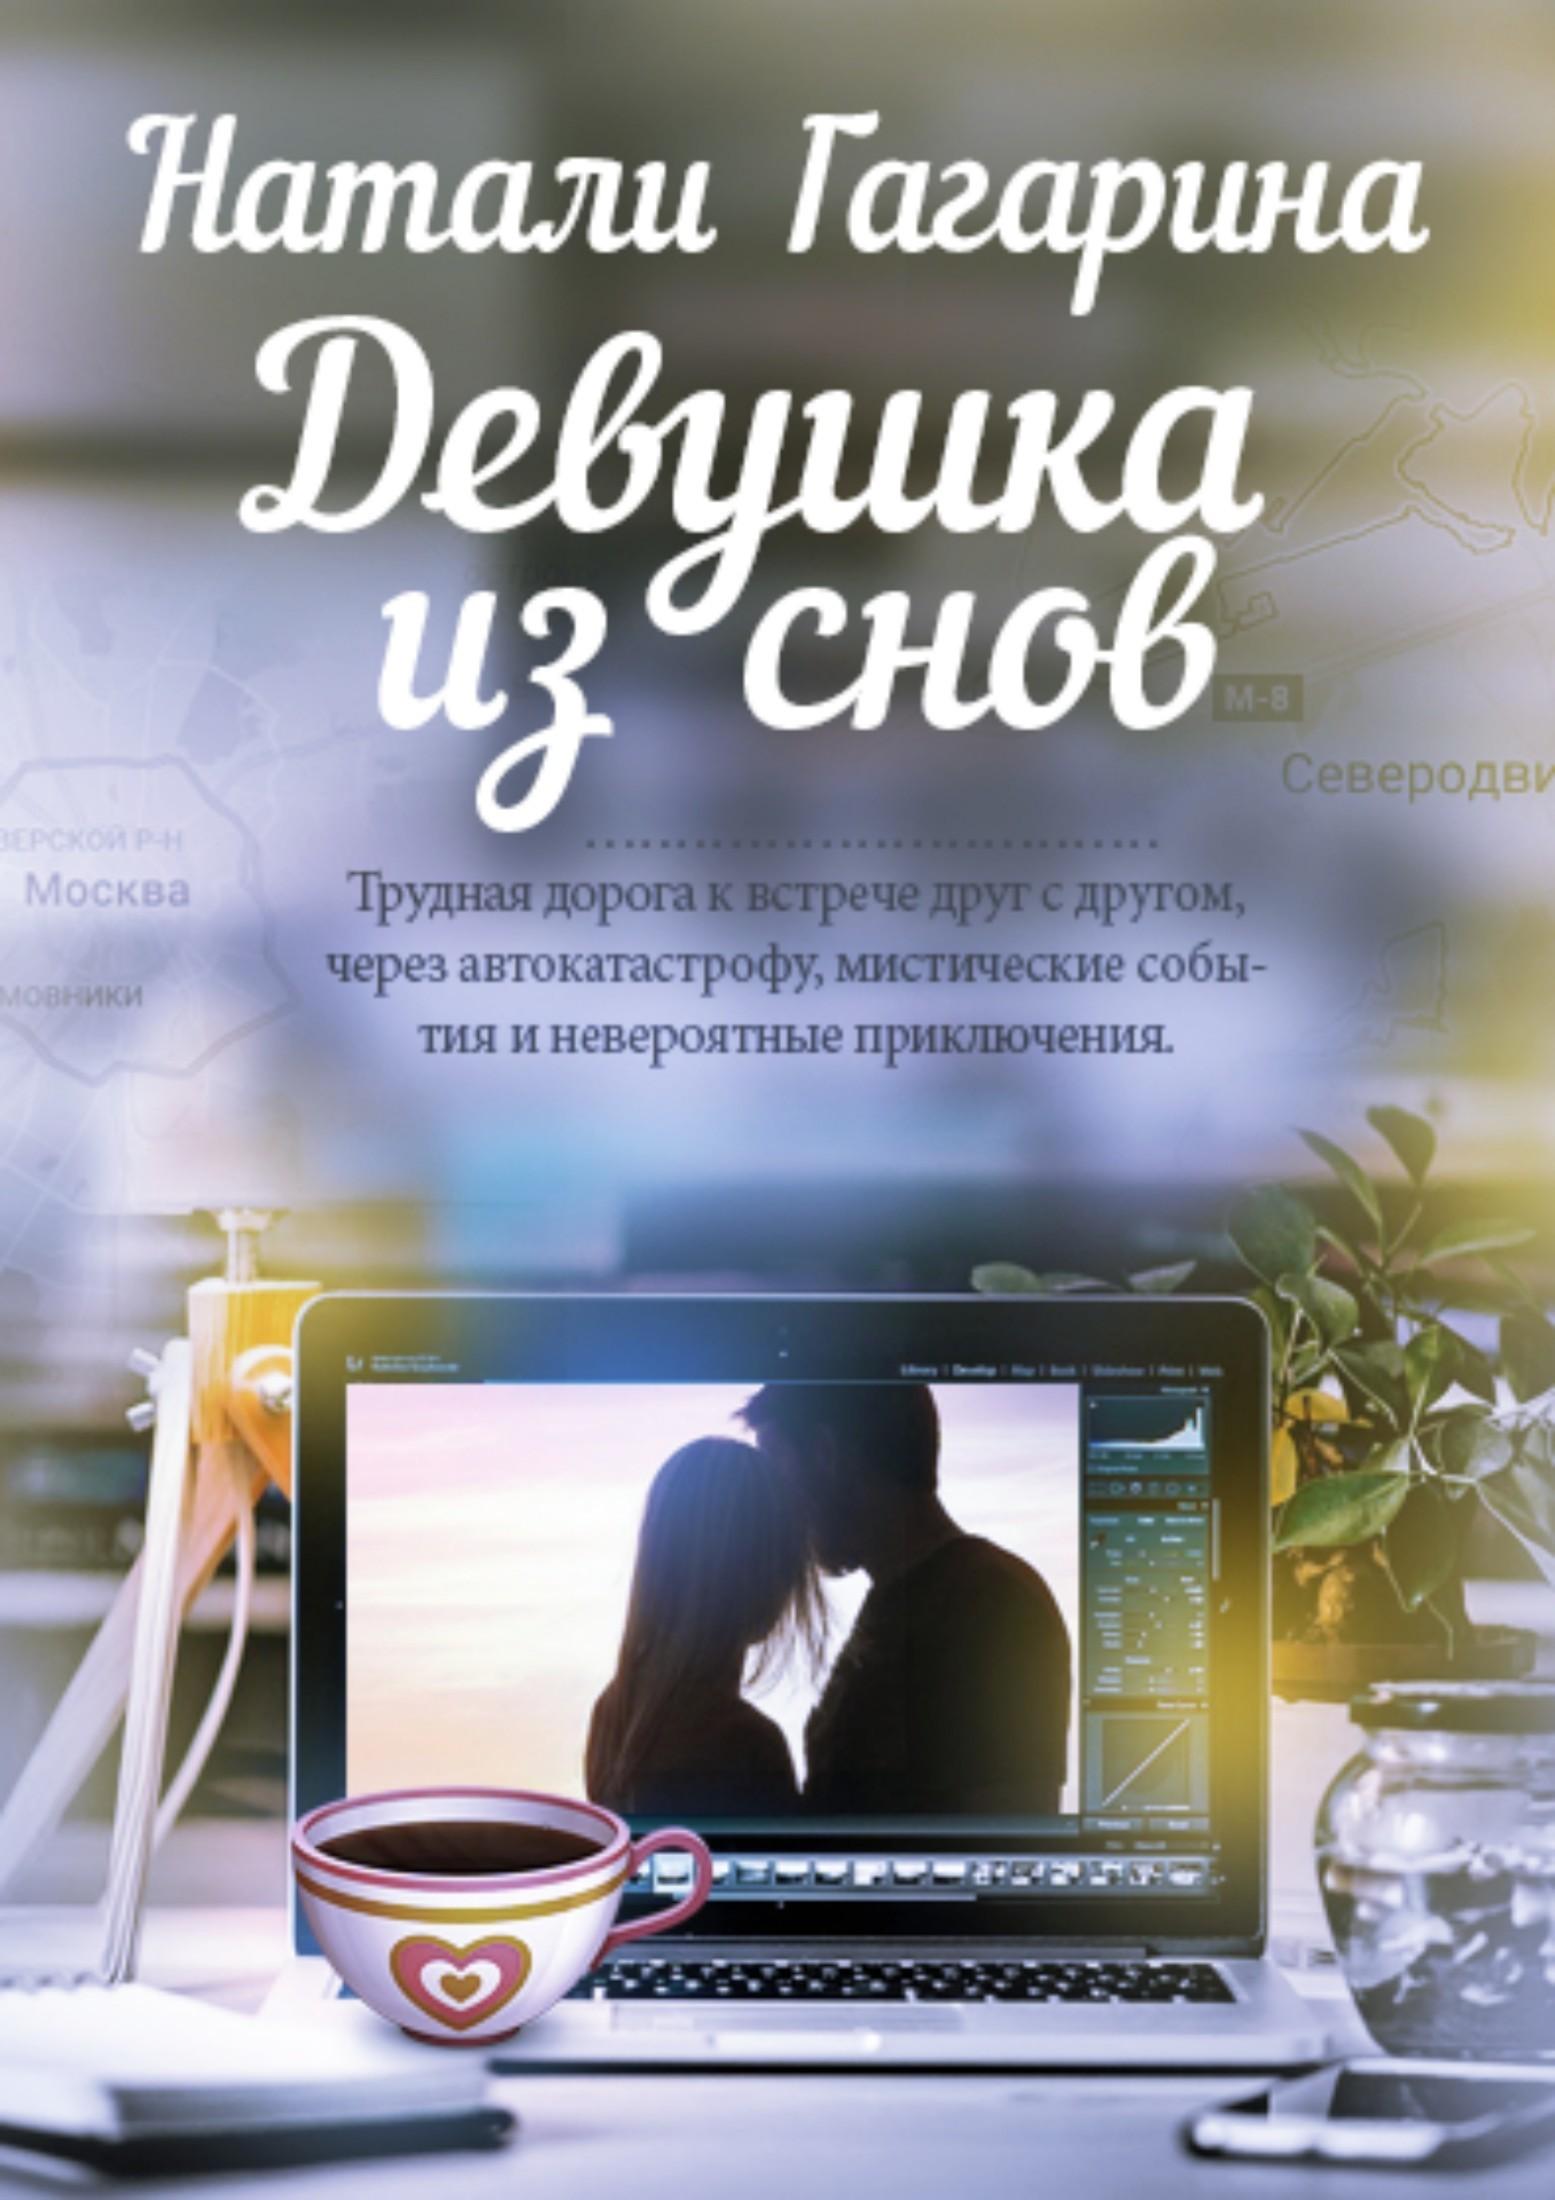 Натали Гагарина Девушка из снов